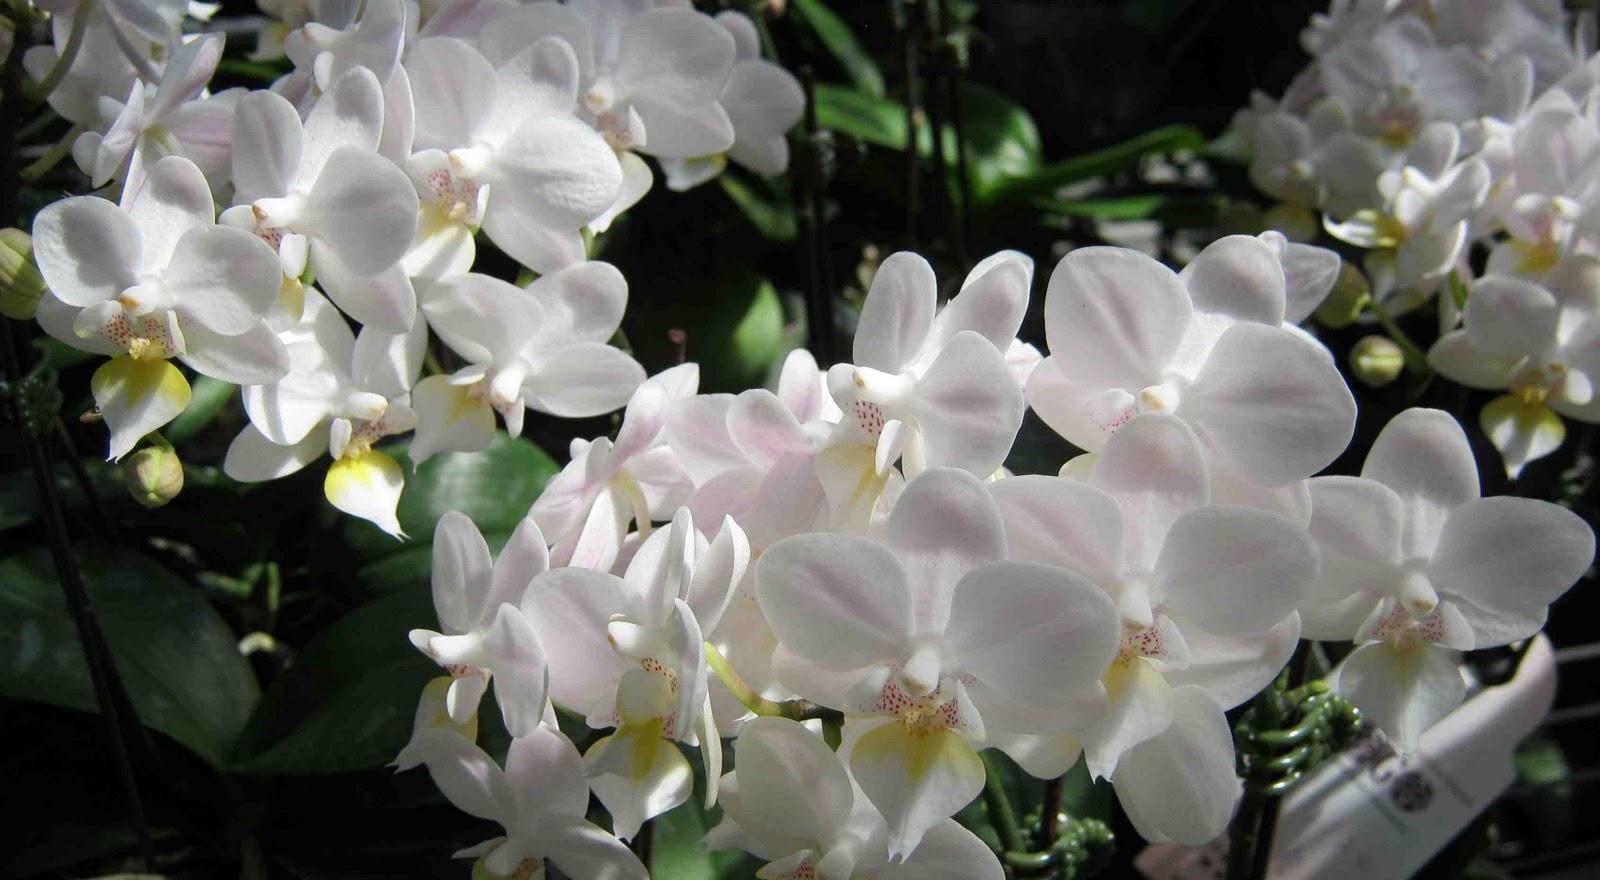 Philippine gardener taiwans gems phalaenopsis orchids part 1 mightylinksfo